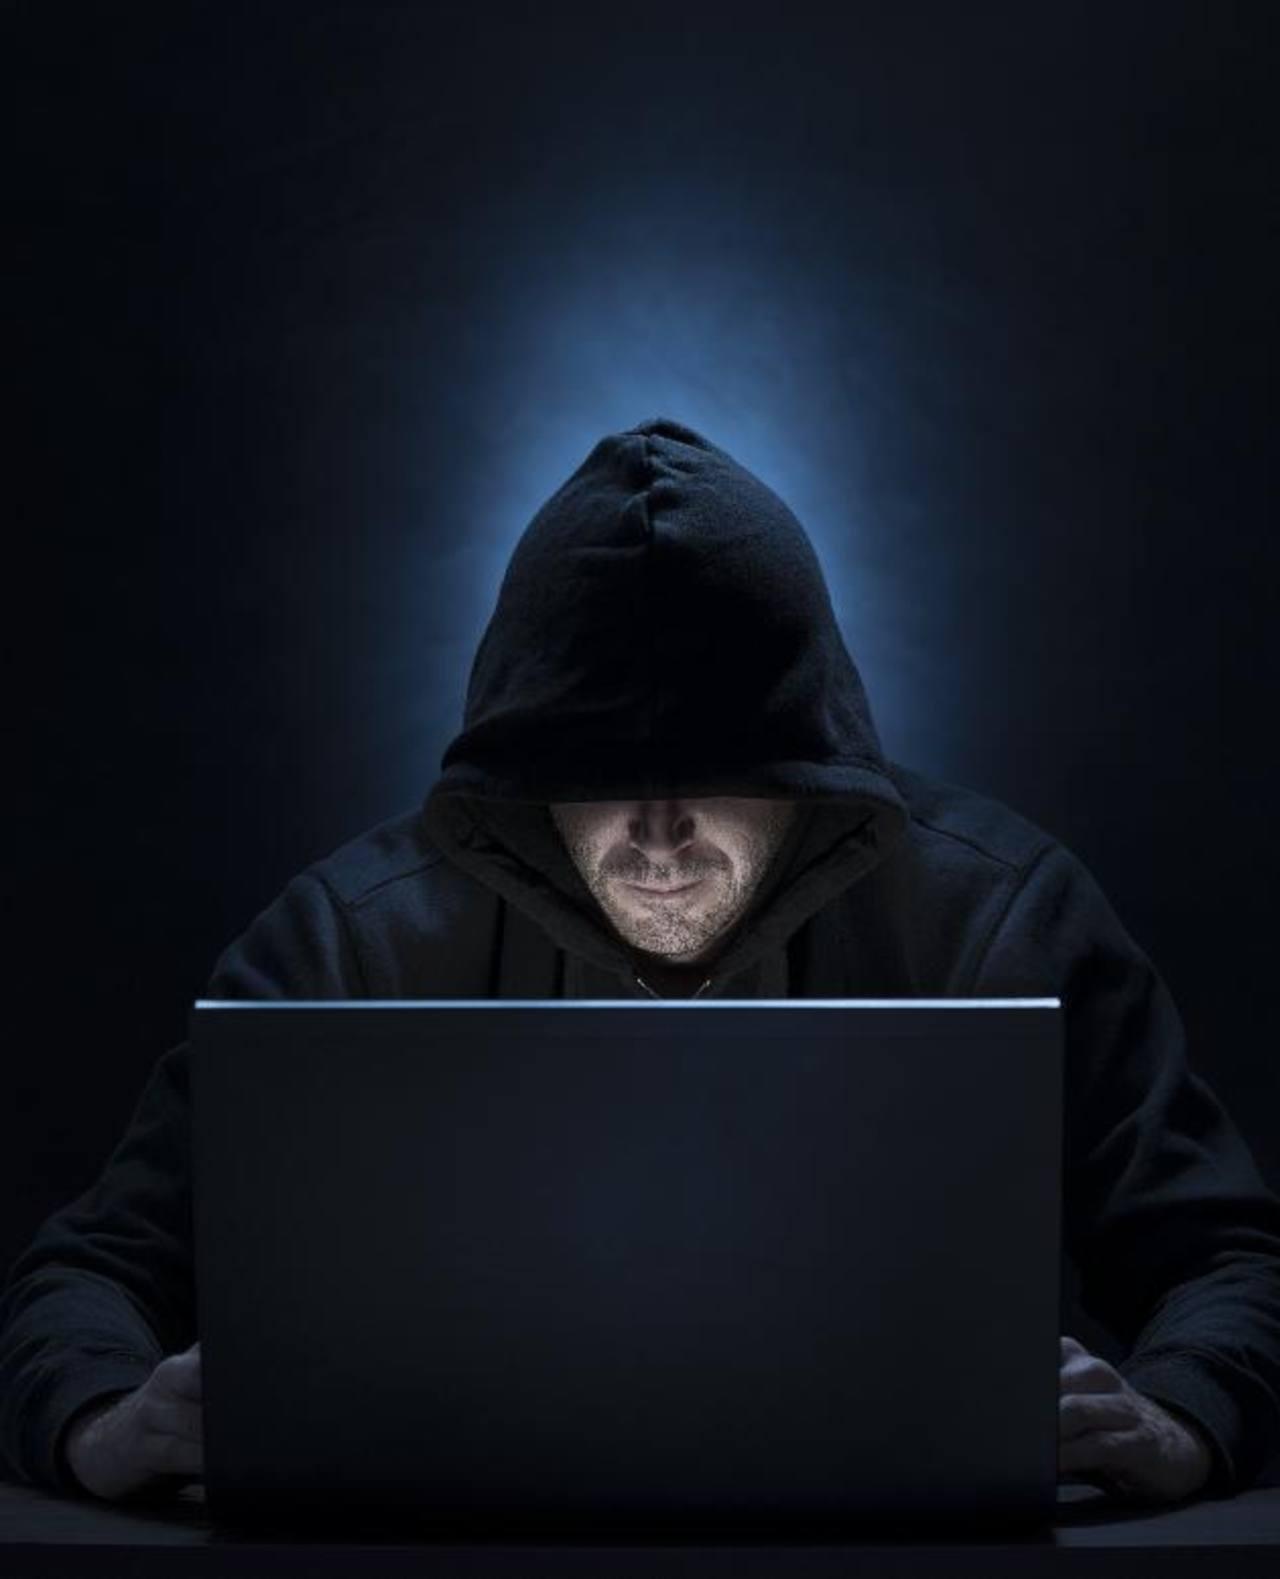 El cibercrimen ha aumentado en 2015